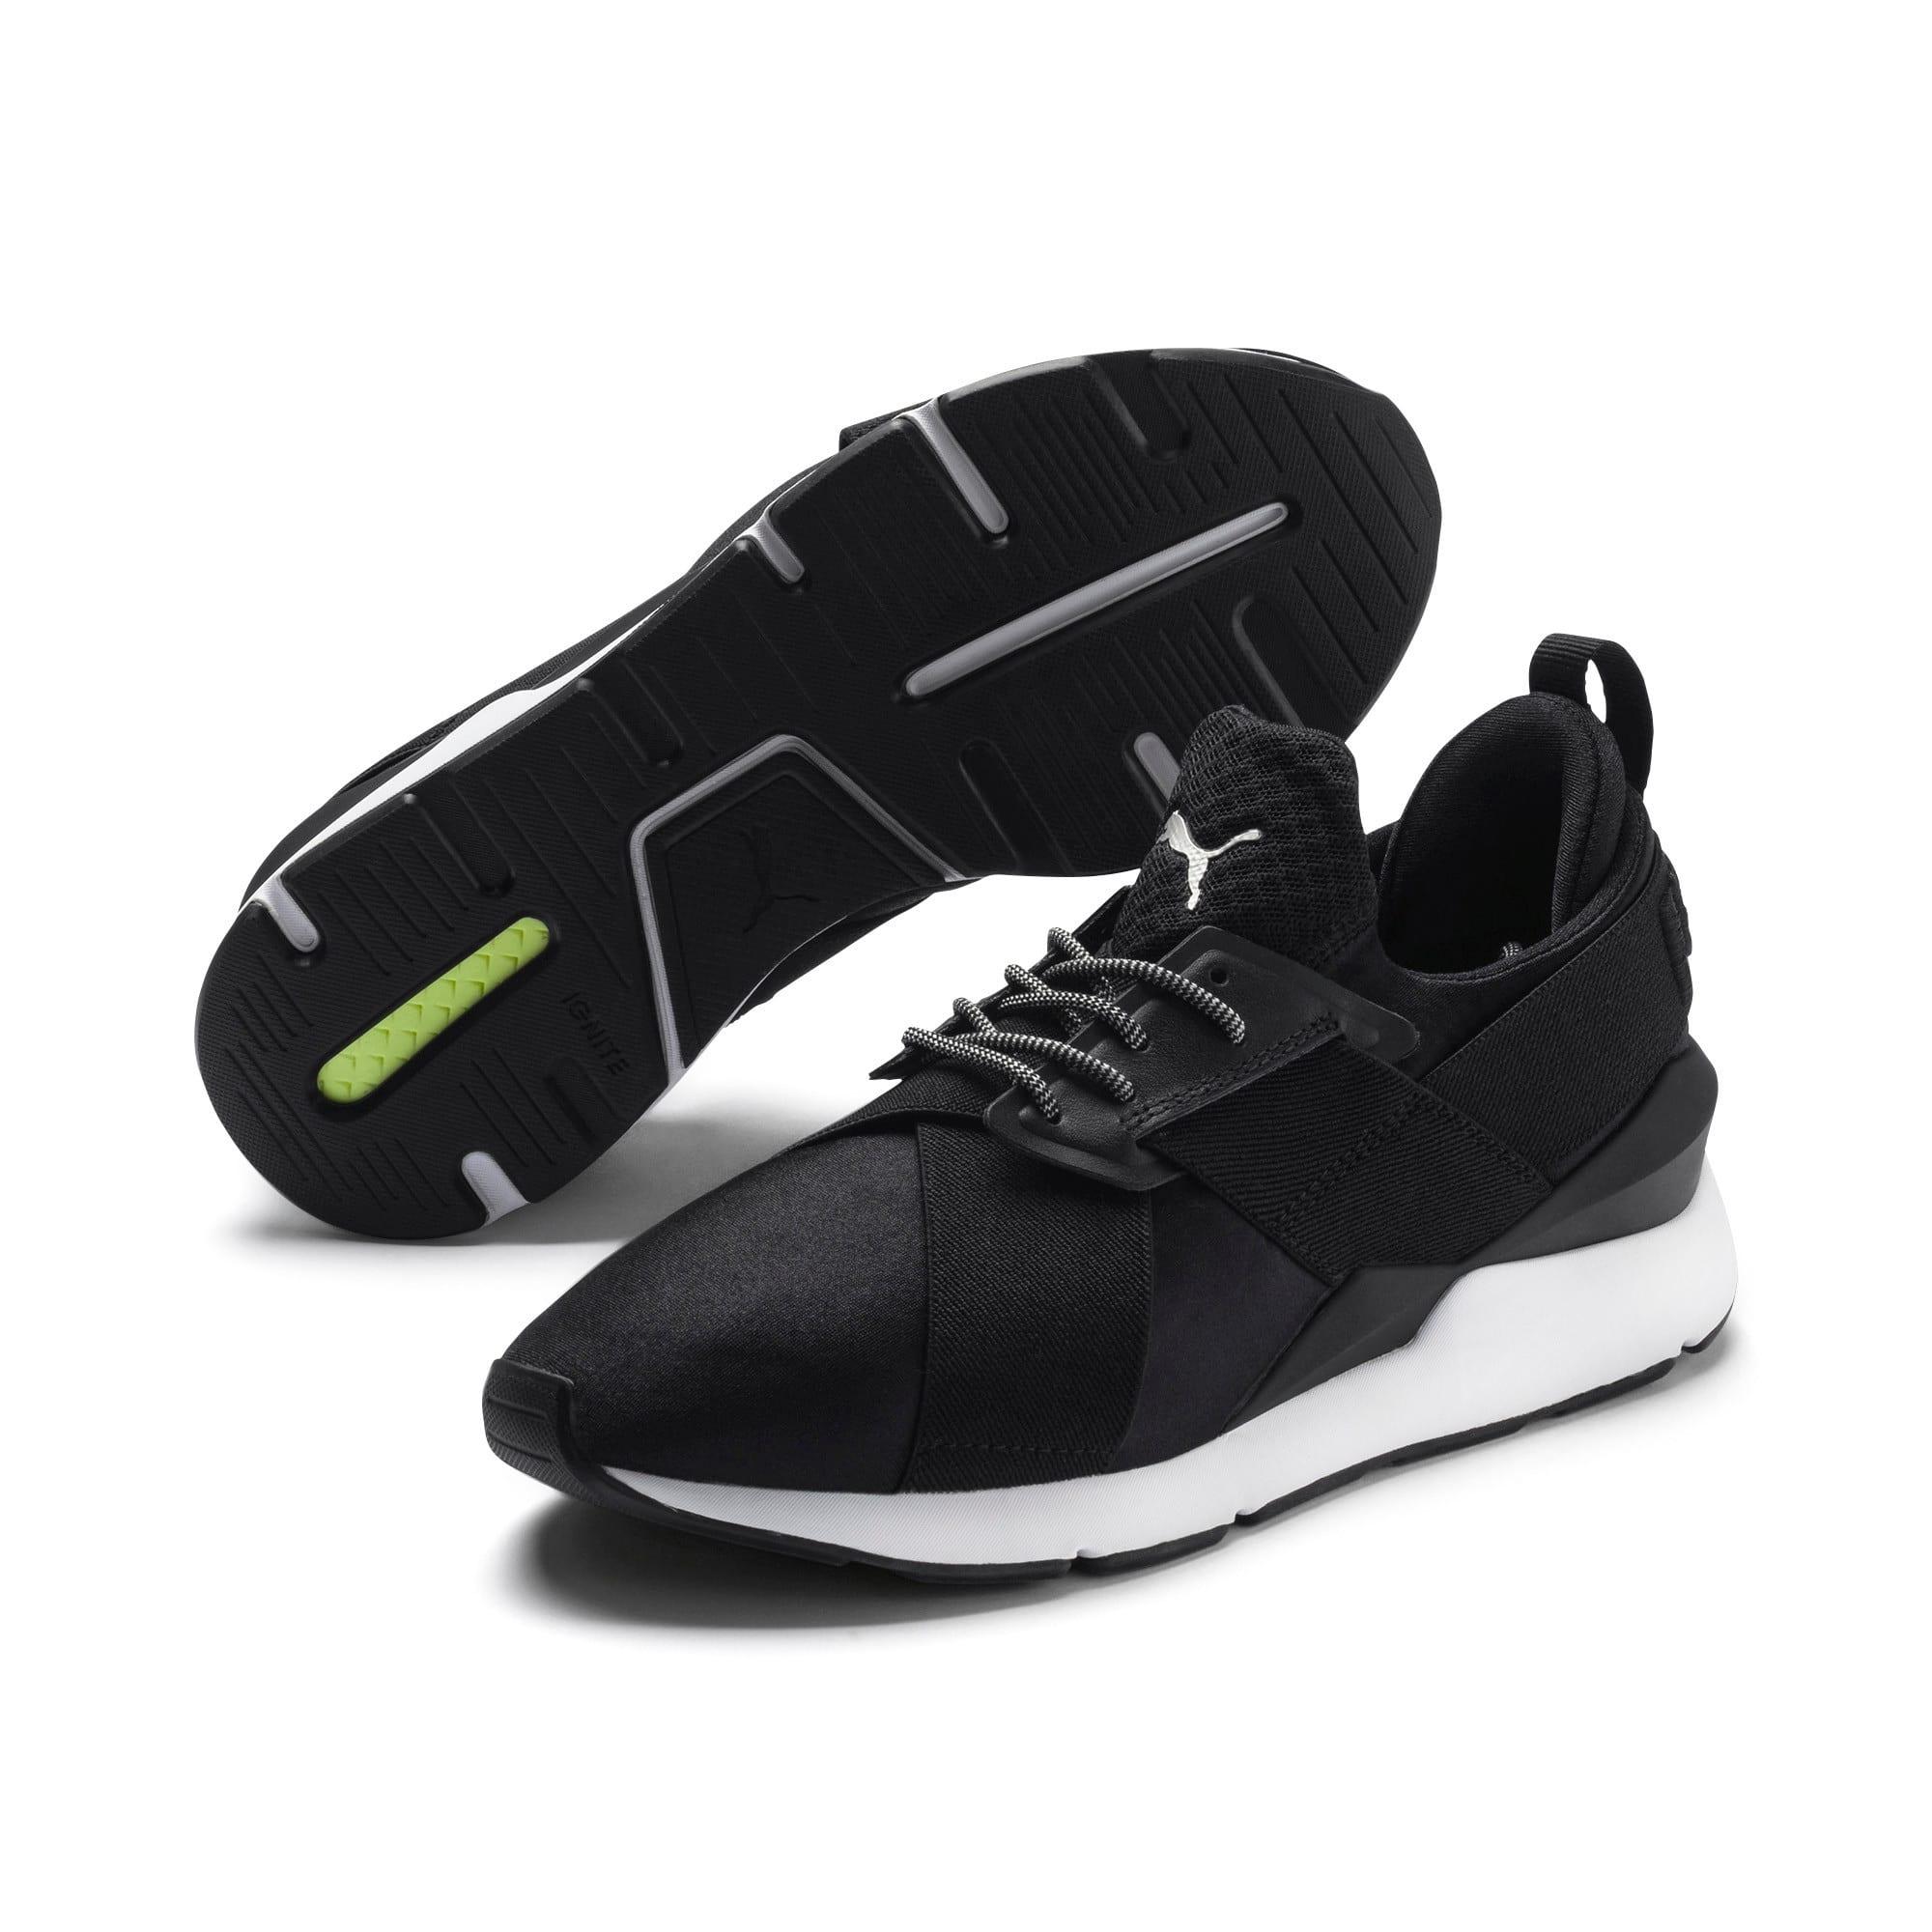 Thumbnail 2 of En Pointe Muse Satin Women's Sneakers, Puma Black-Puma White, medium